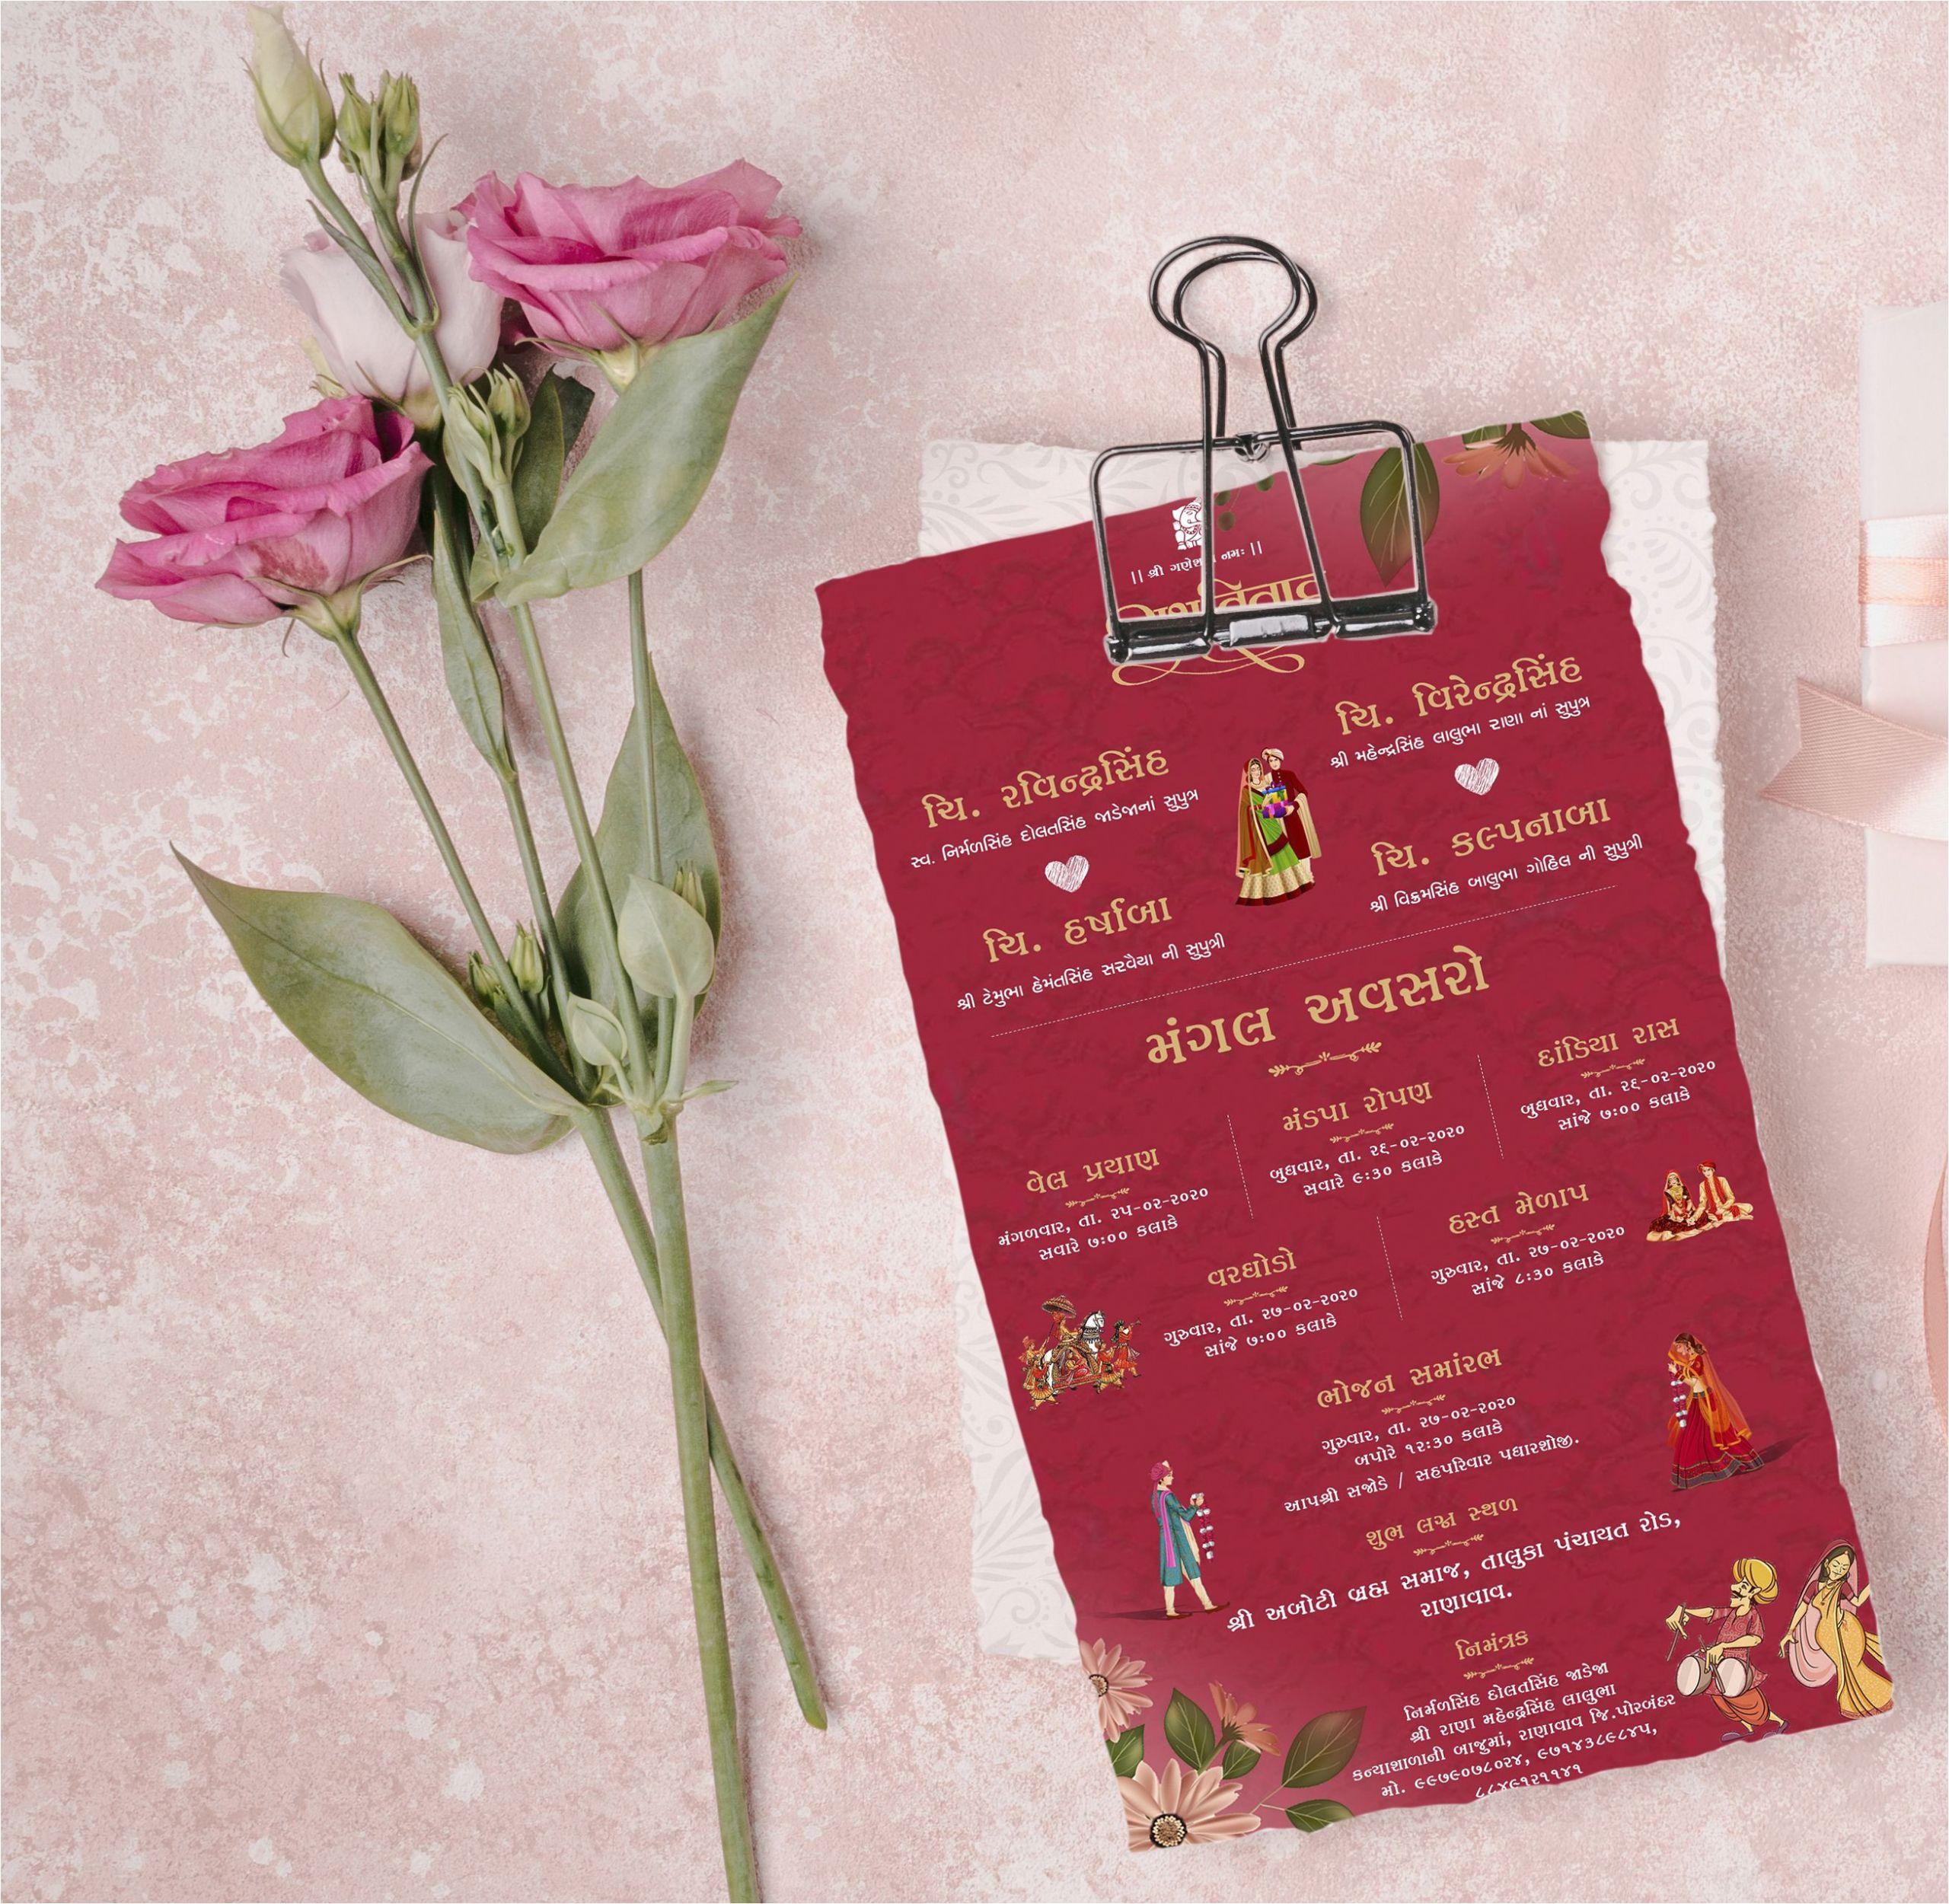 Shaadi Ke Card Ke Flower Marriage Invitation Card In Gujarati Gujarati Lagn Amntran